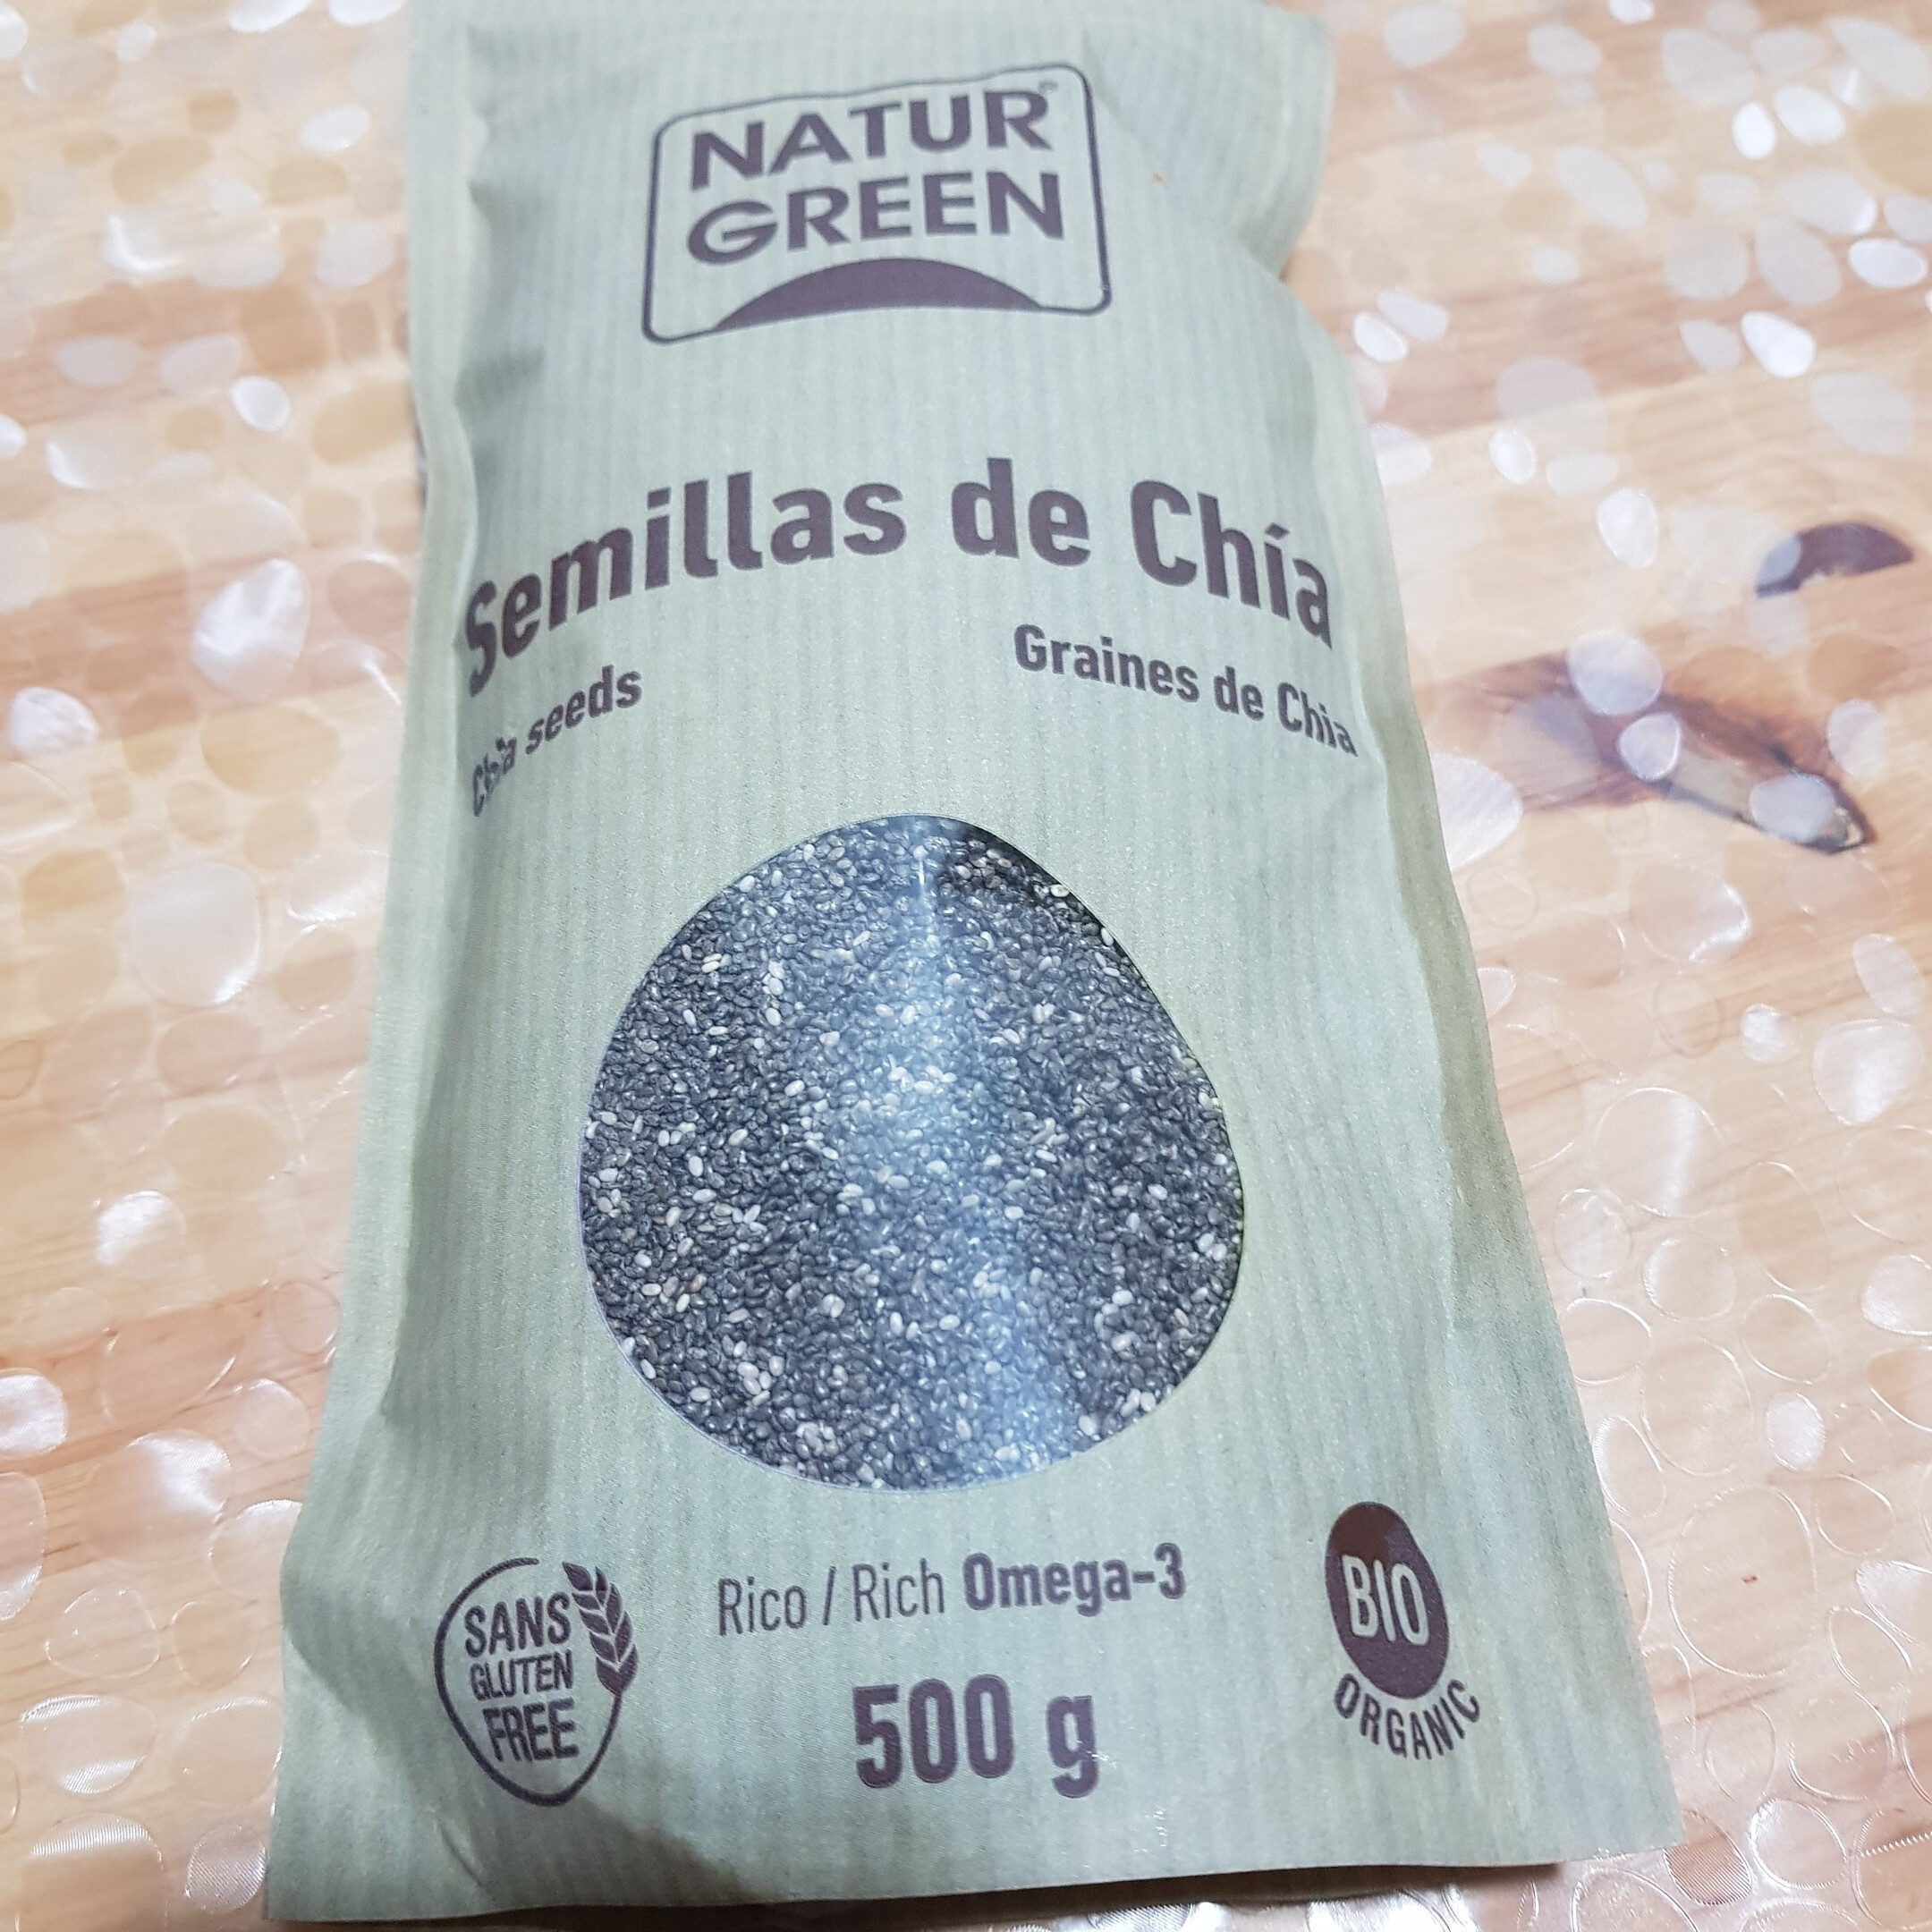 Semillas de chía - Produit